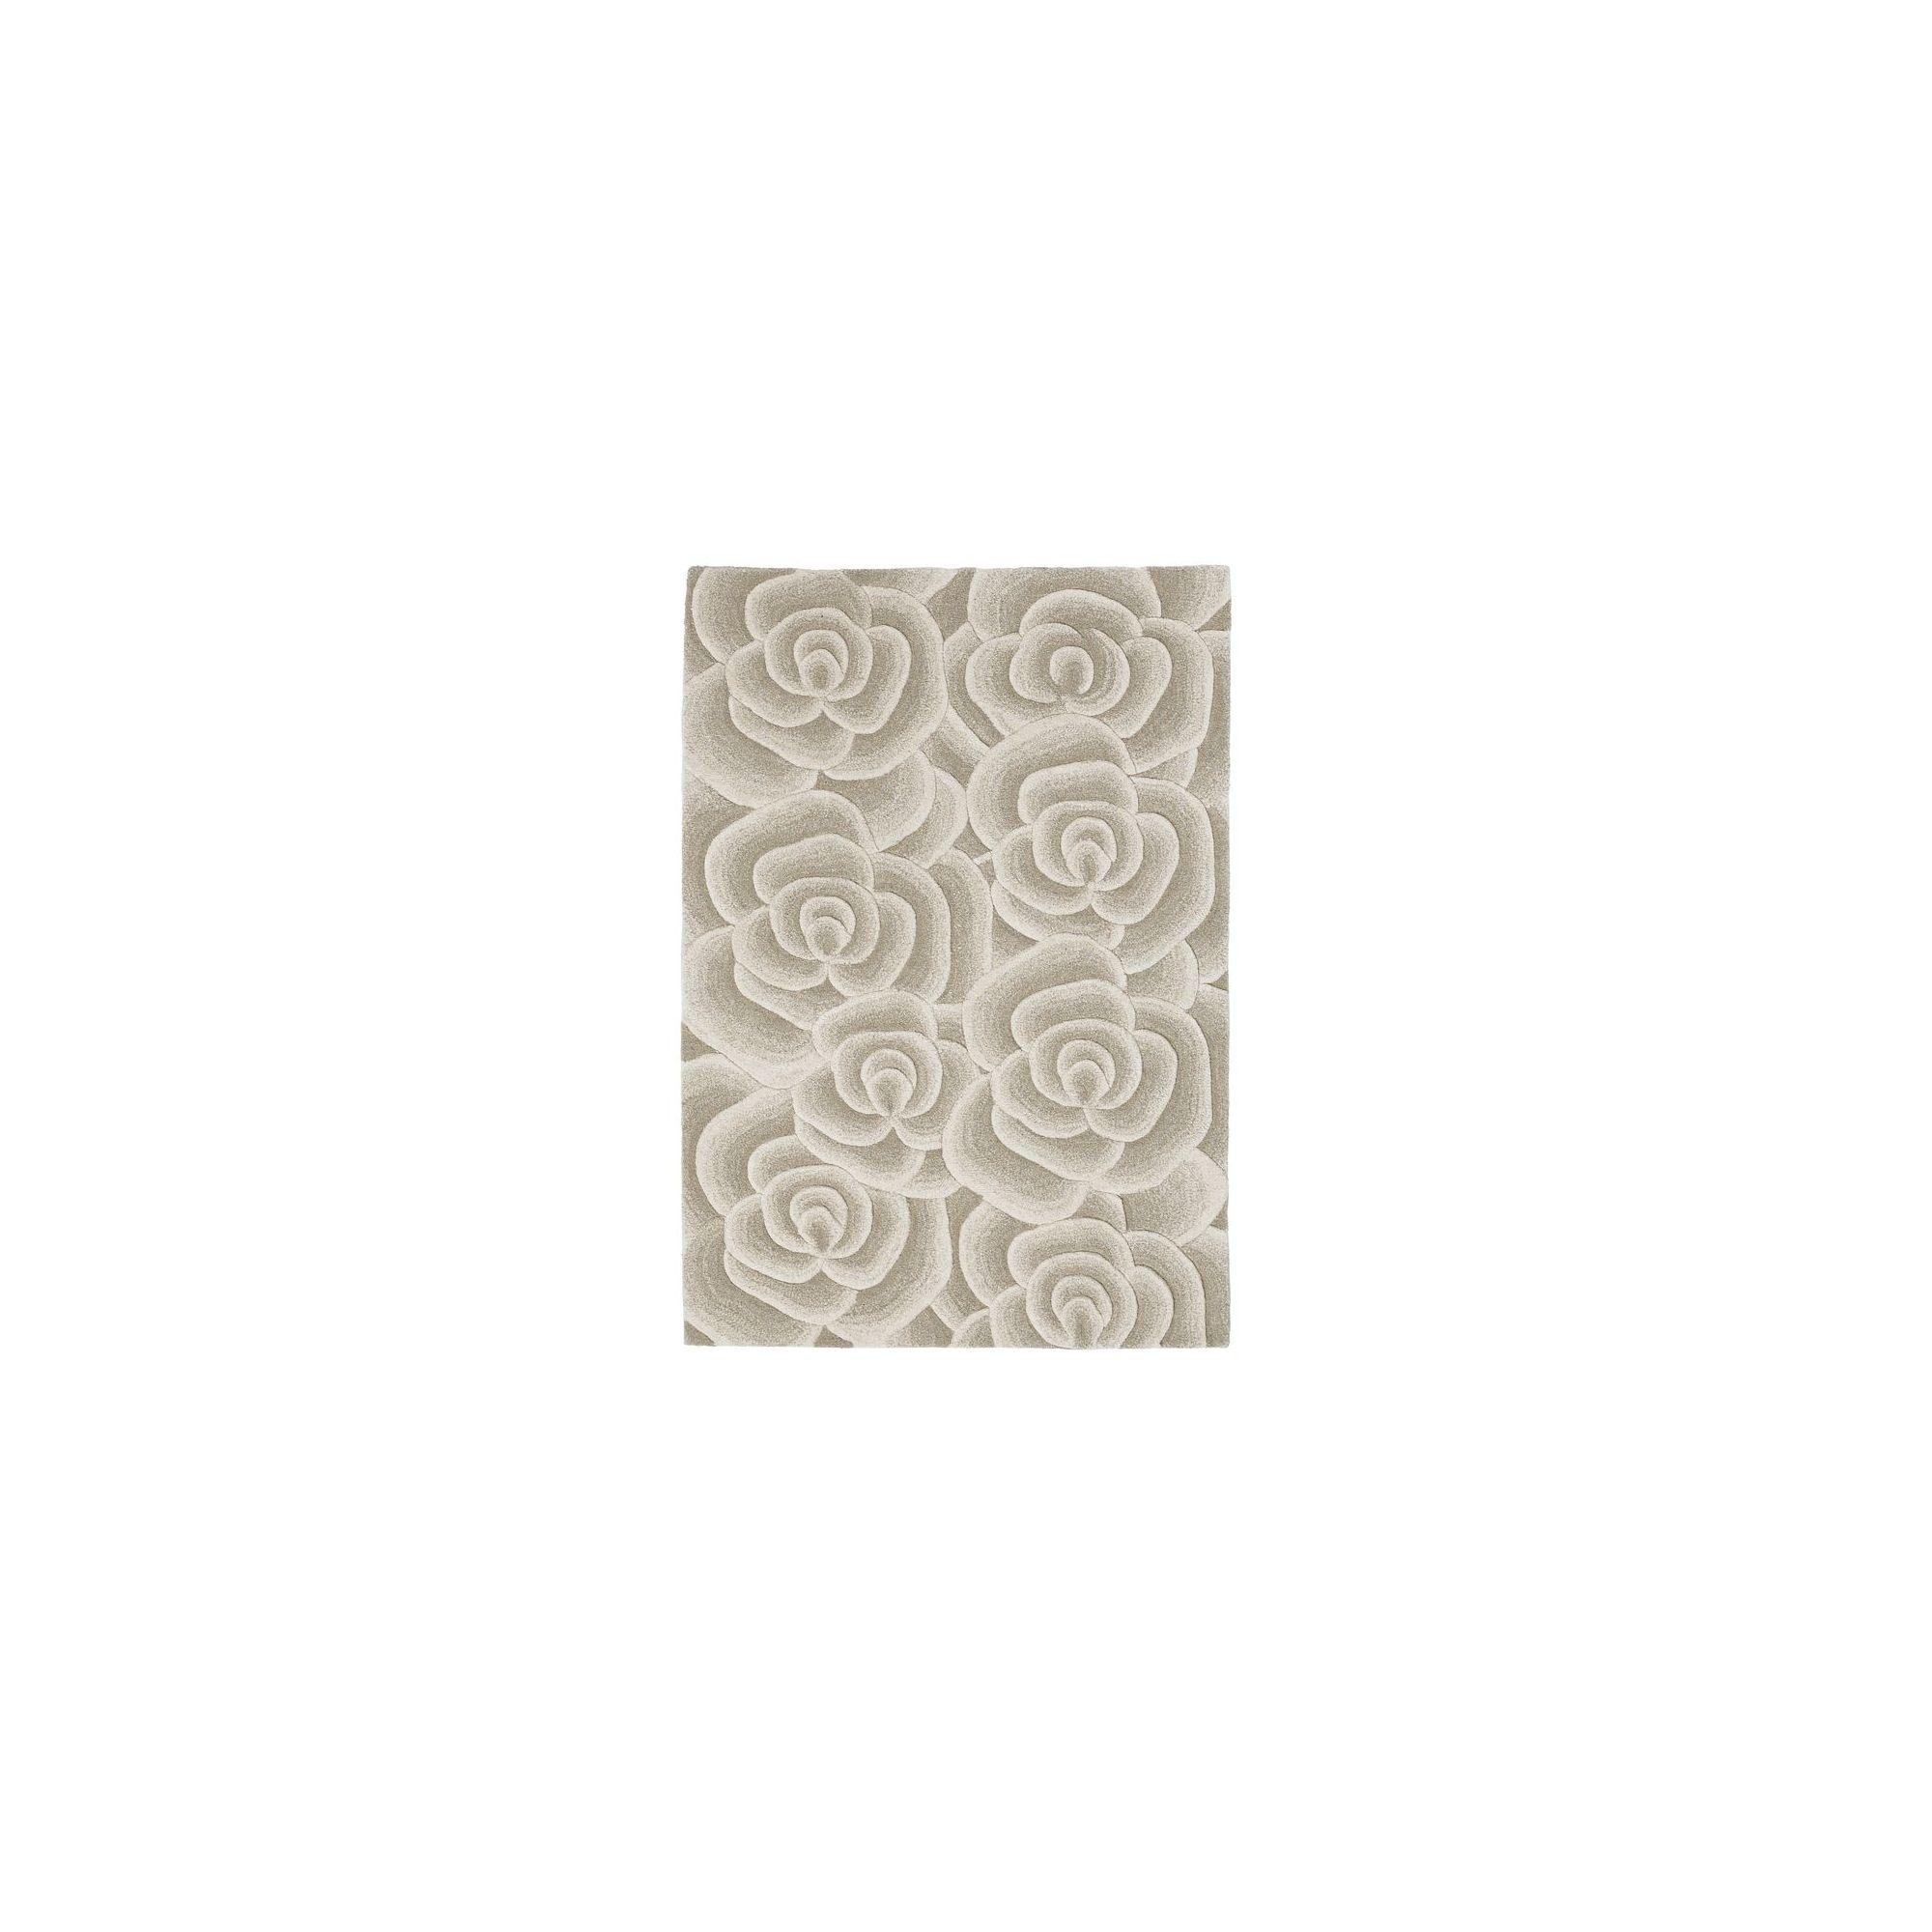 Oriental Carpets & Rugs Valentine VL-10 Beige Rug - 90cm x 150cm